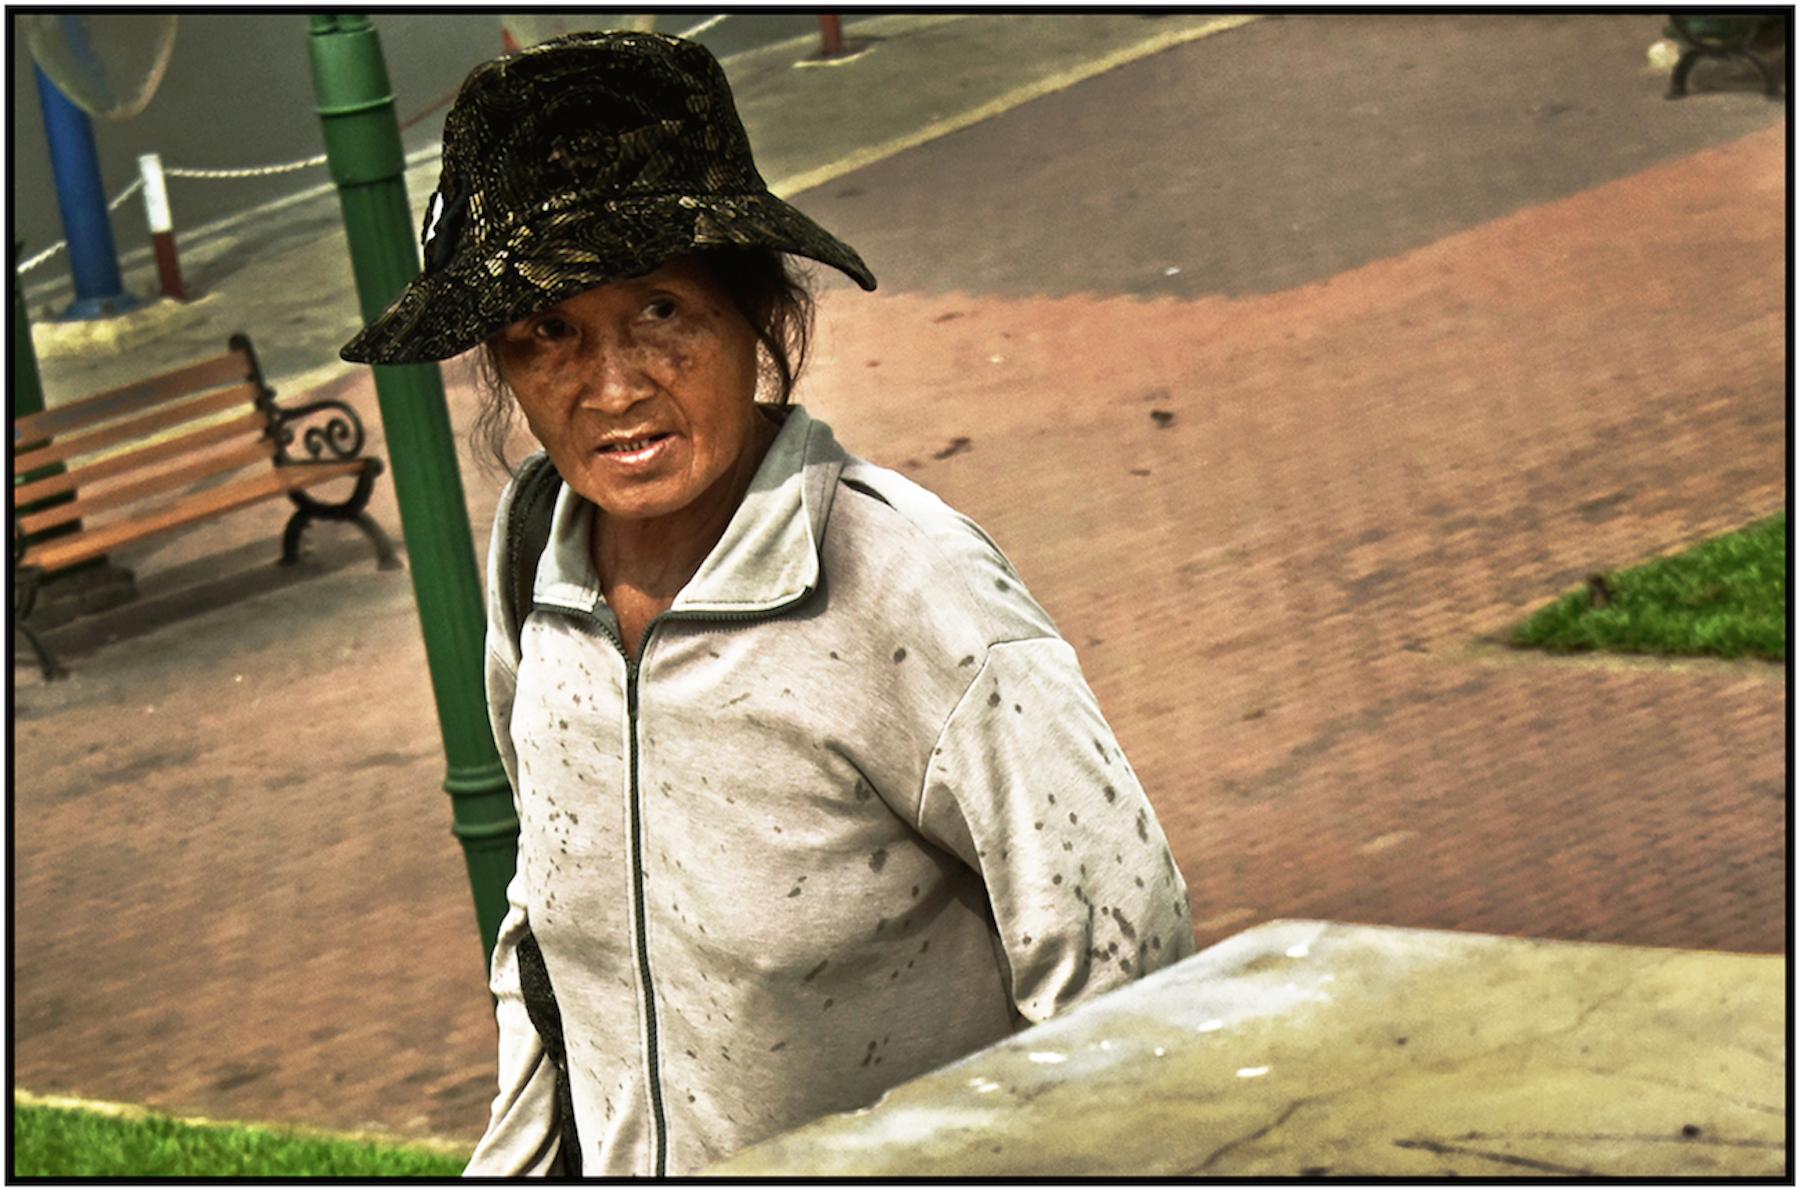 Impoverished woman, Saigon/HCMC, Dec. 2015. #3381